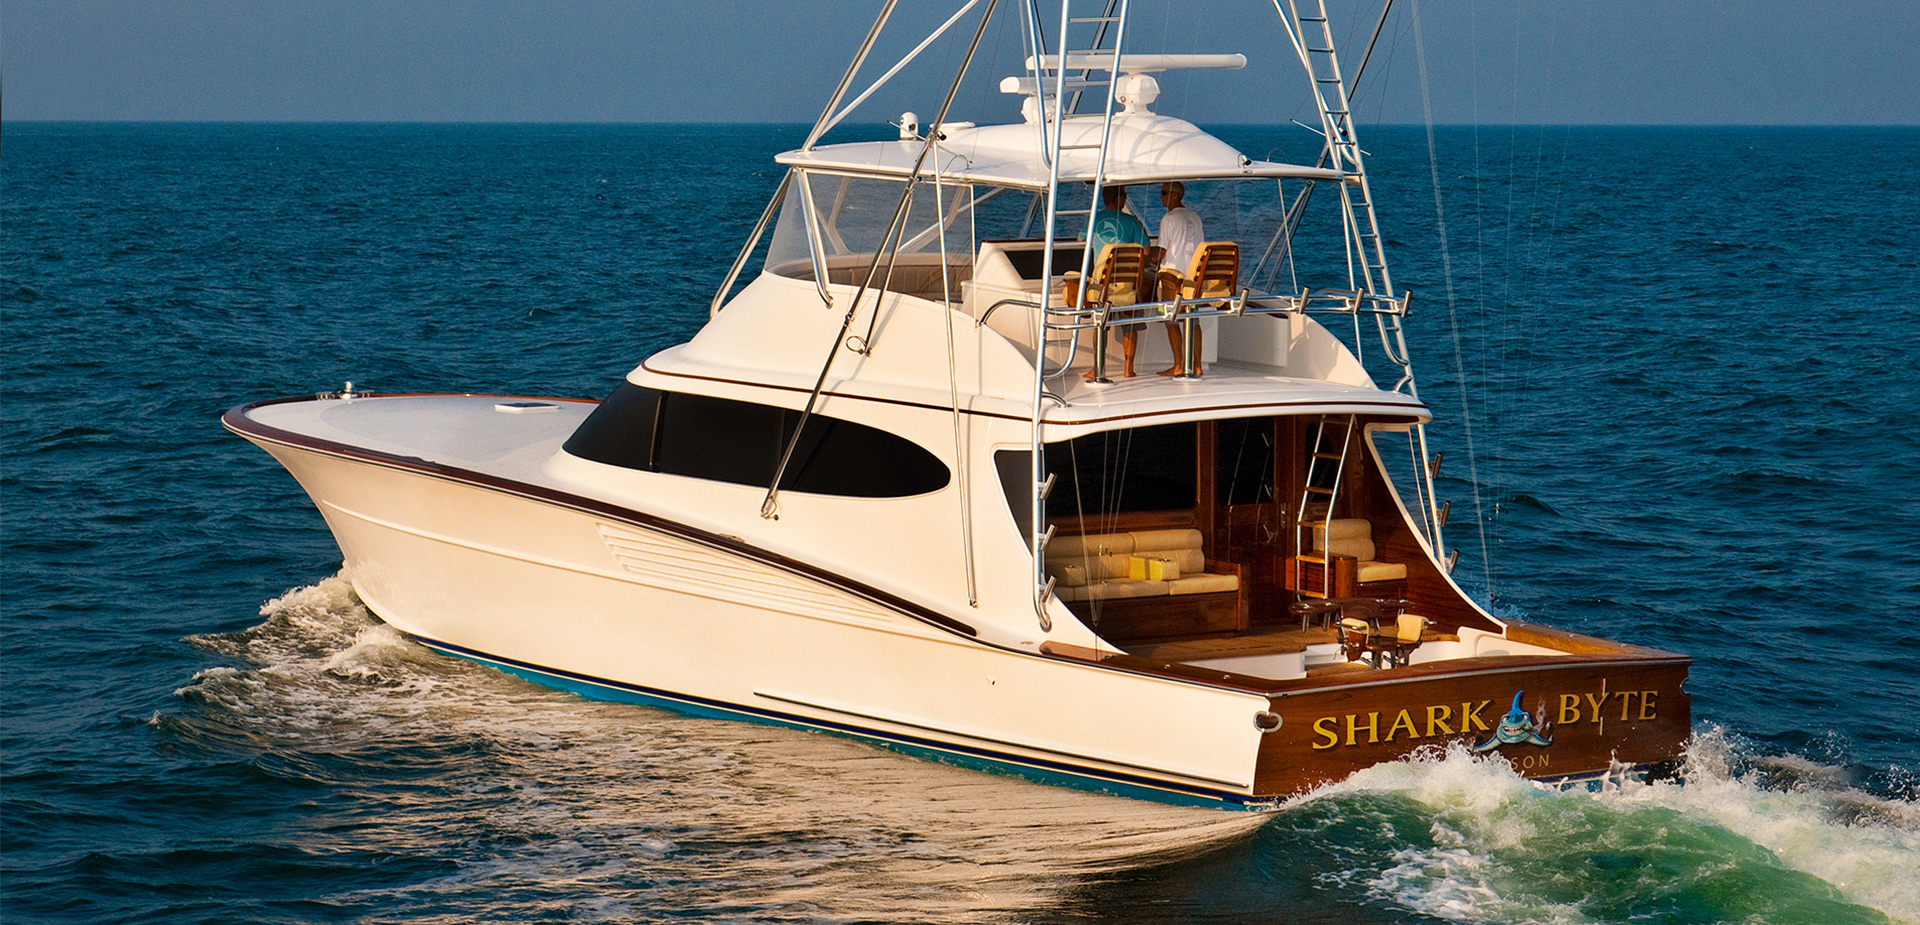 Bayliss 73 39 shark byte custom sport fishing boat for Sport fishing boat